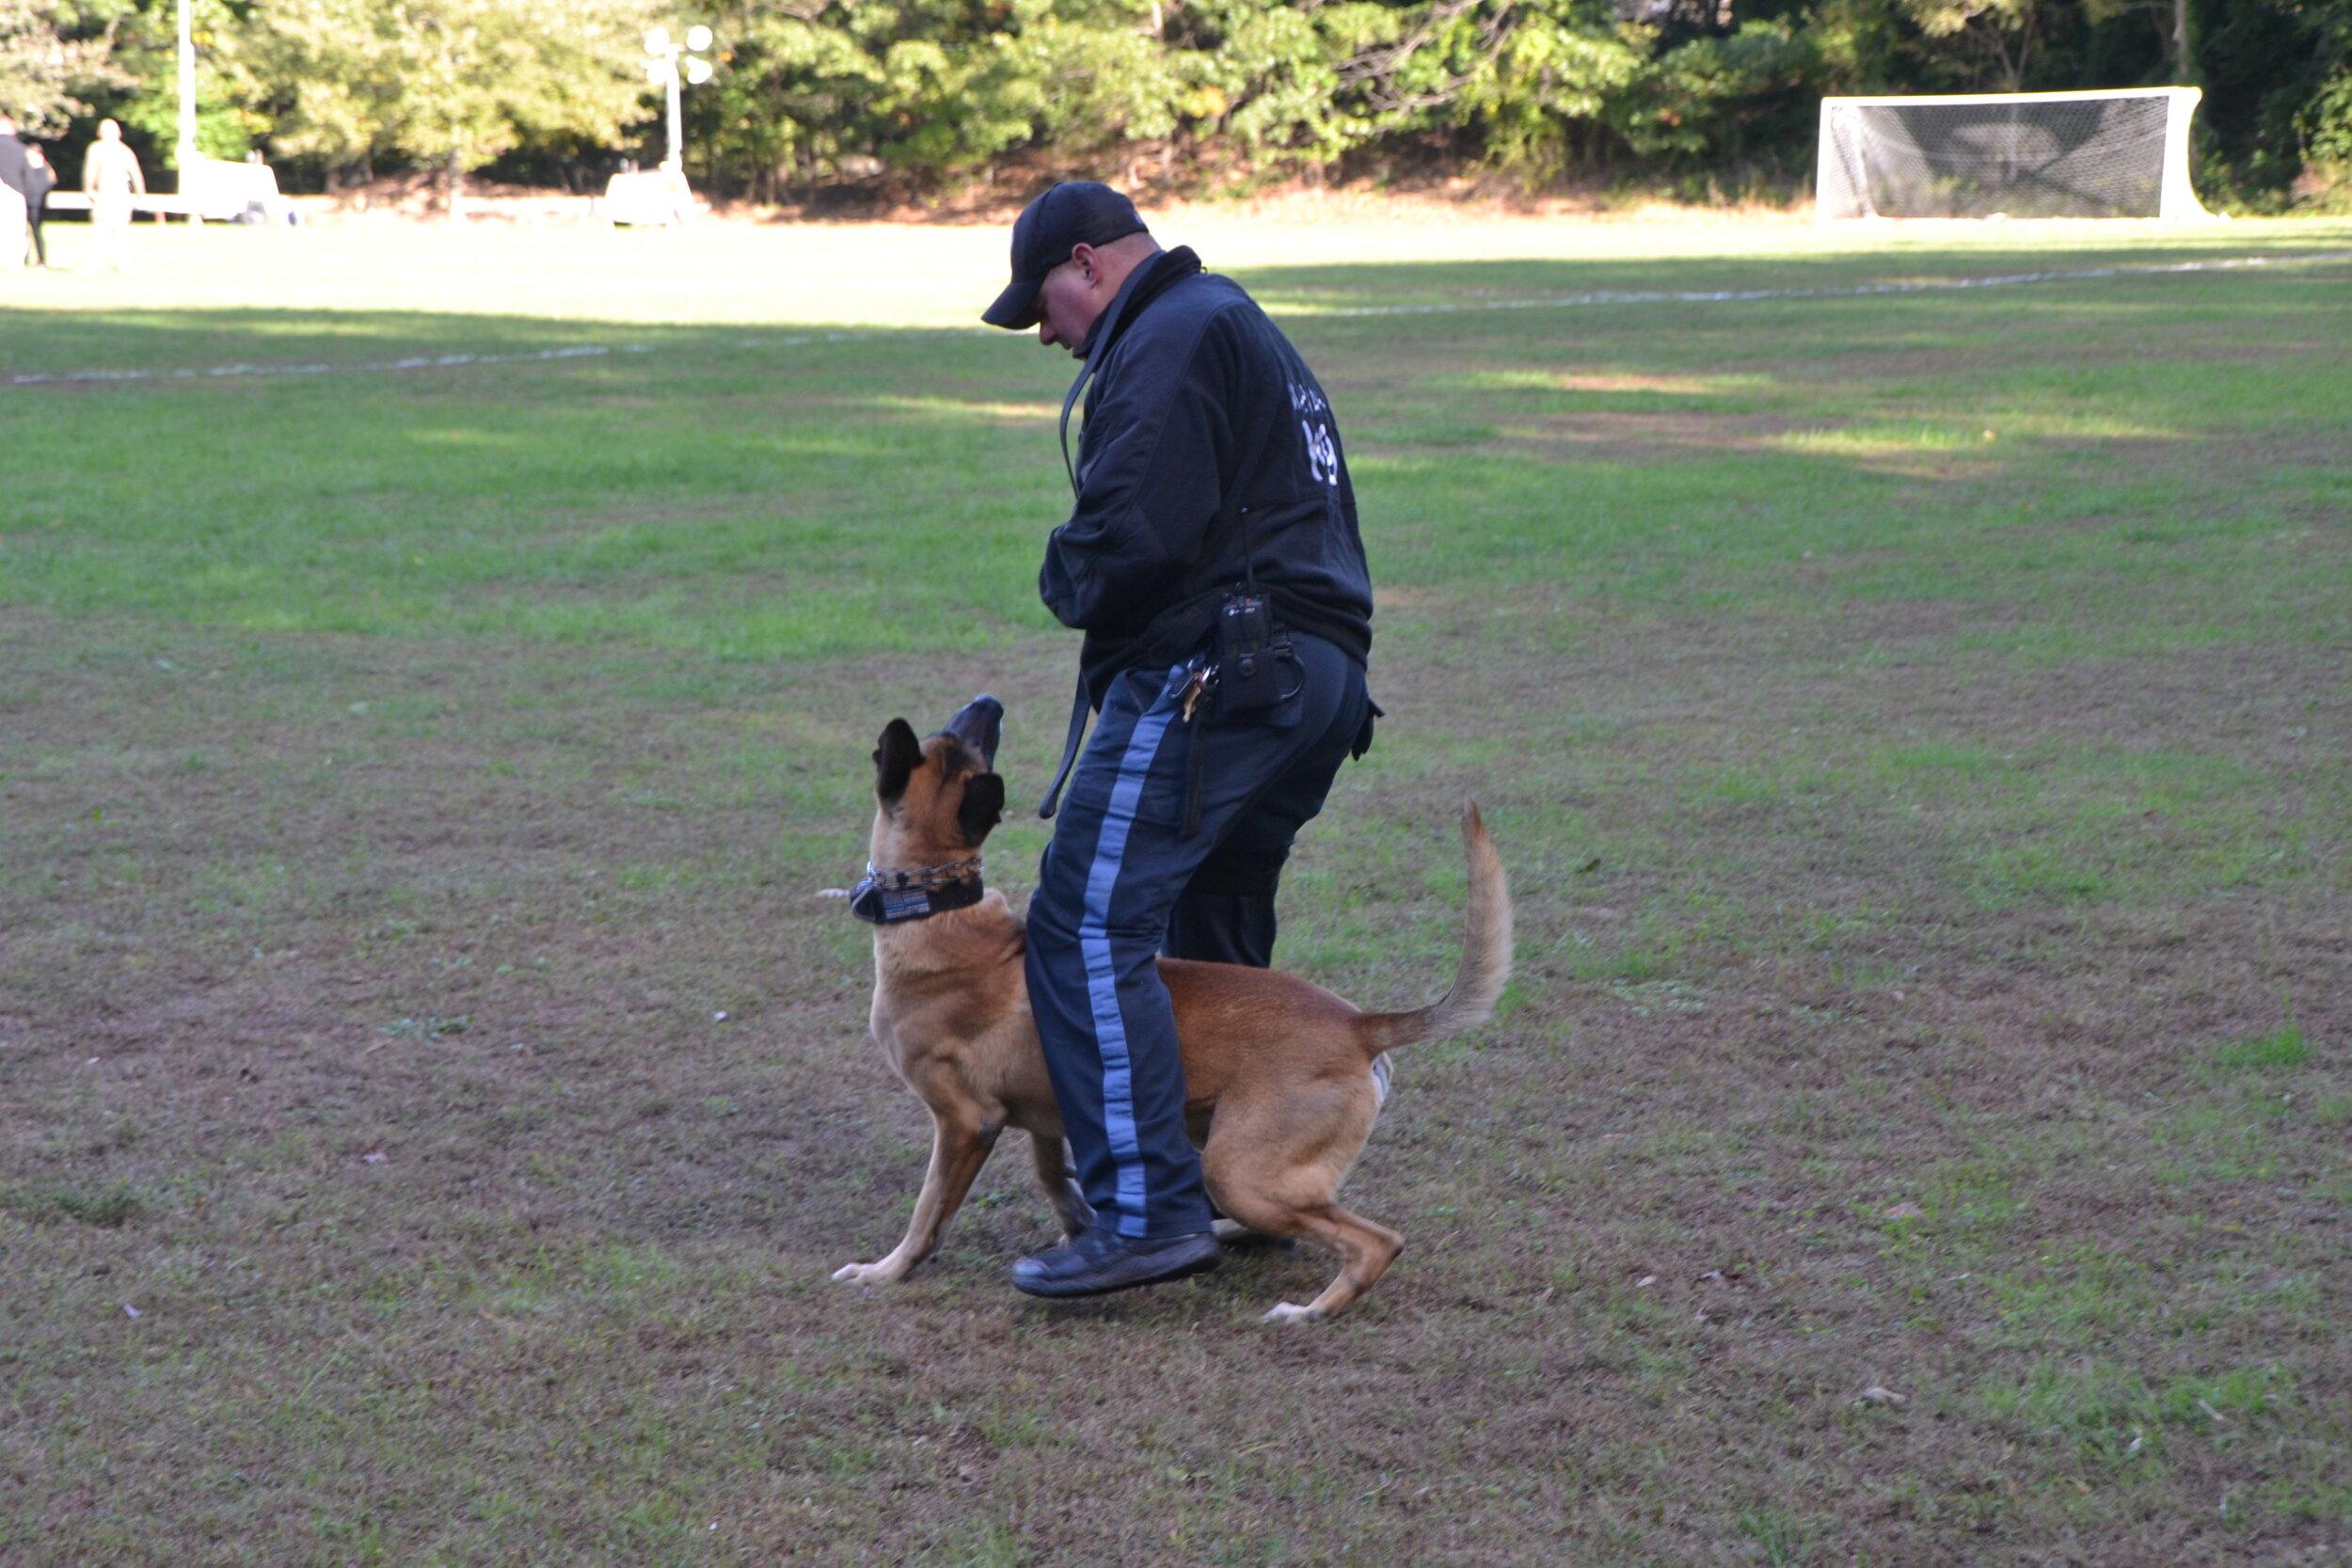 mahwah police k-9 officer and dog